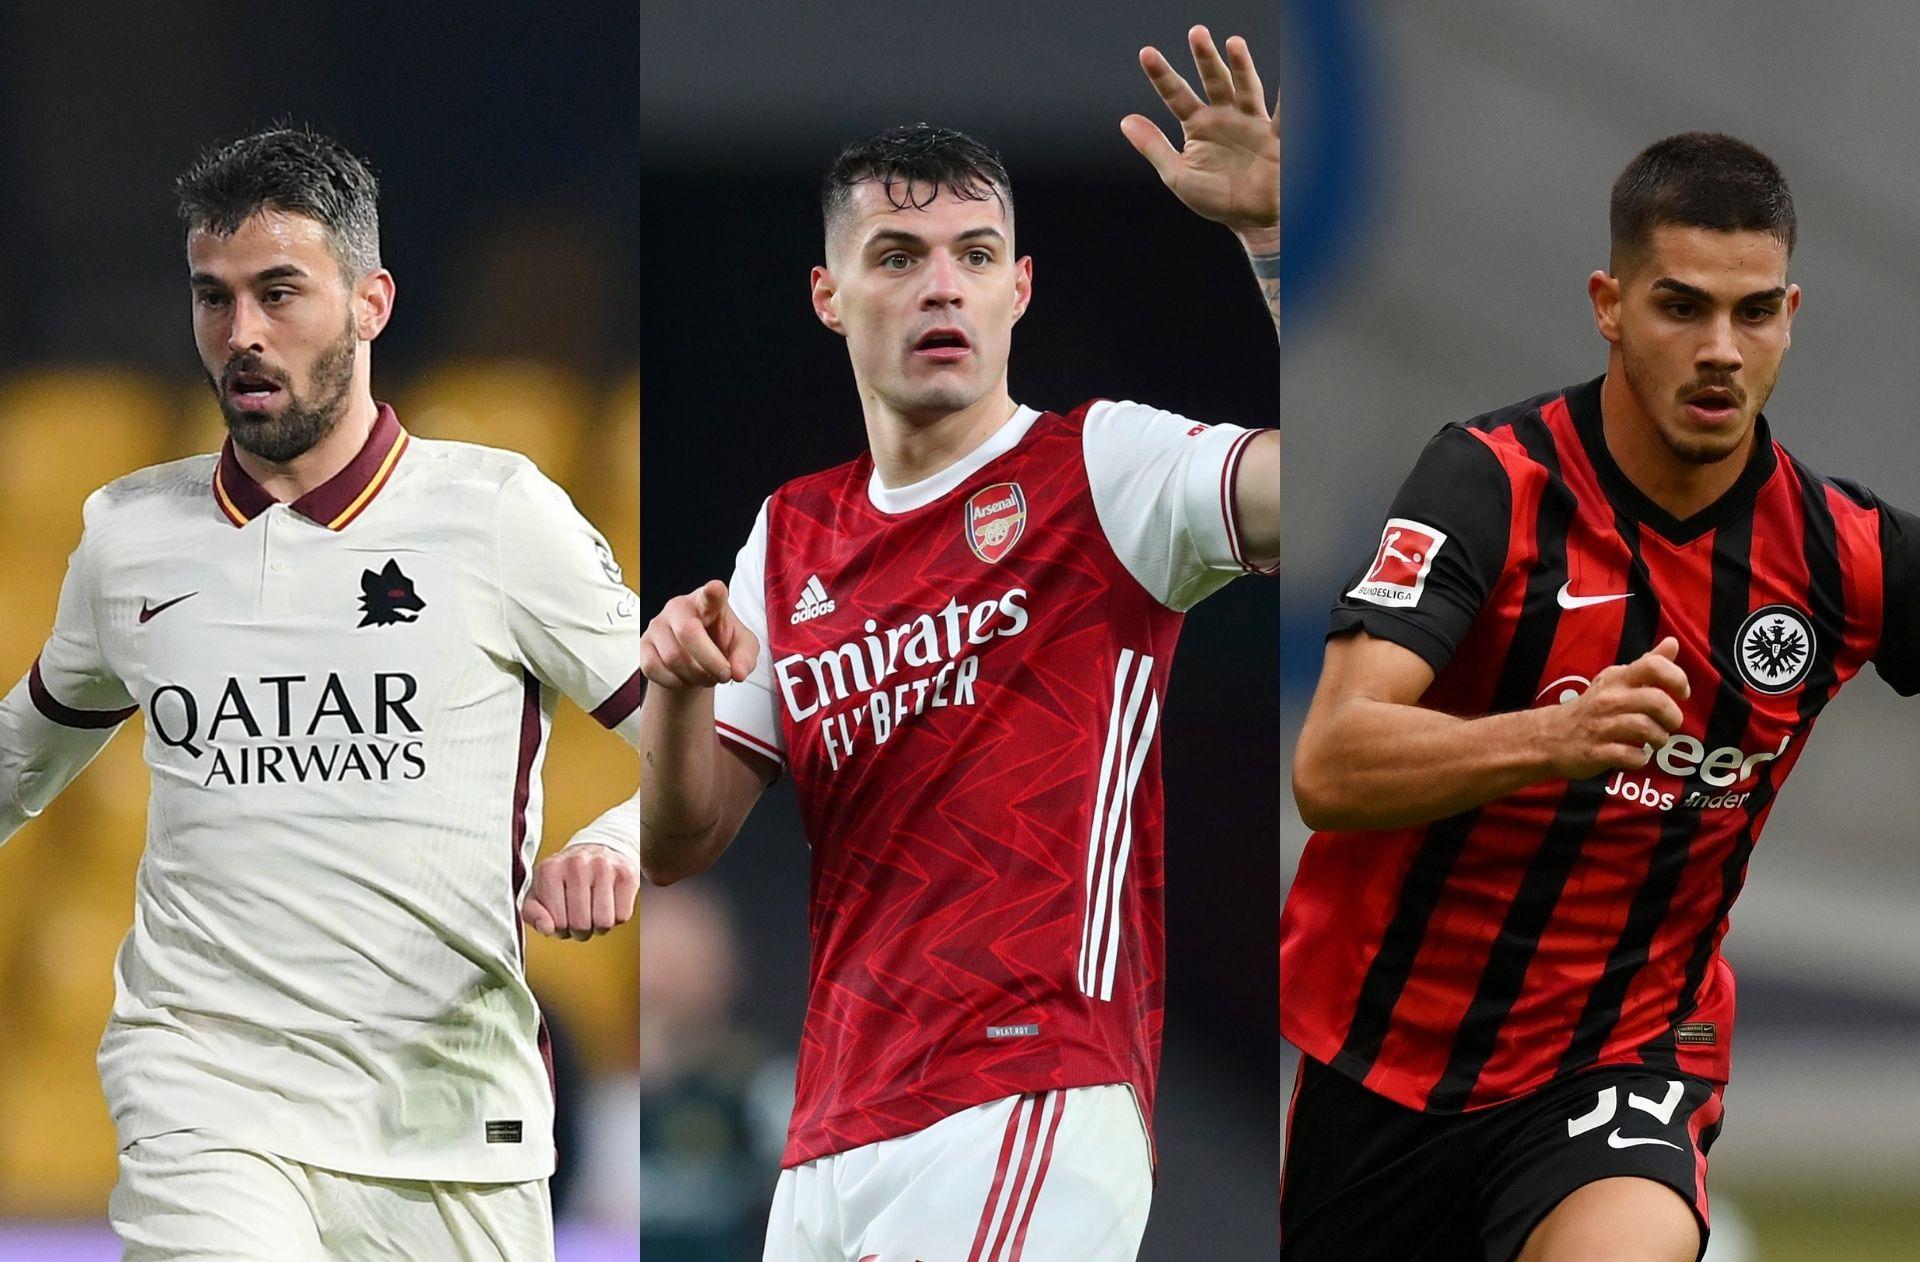 Leonardo Spinazzola of Roma, Granit Xhaka of Arsenal, Andre Silva of Frankfurt